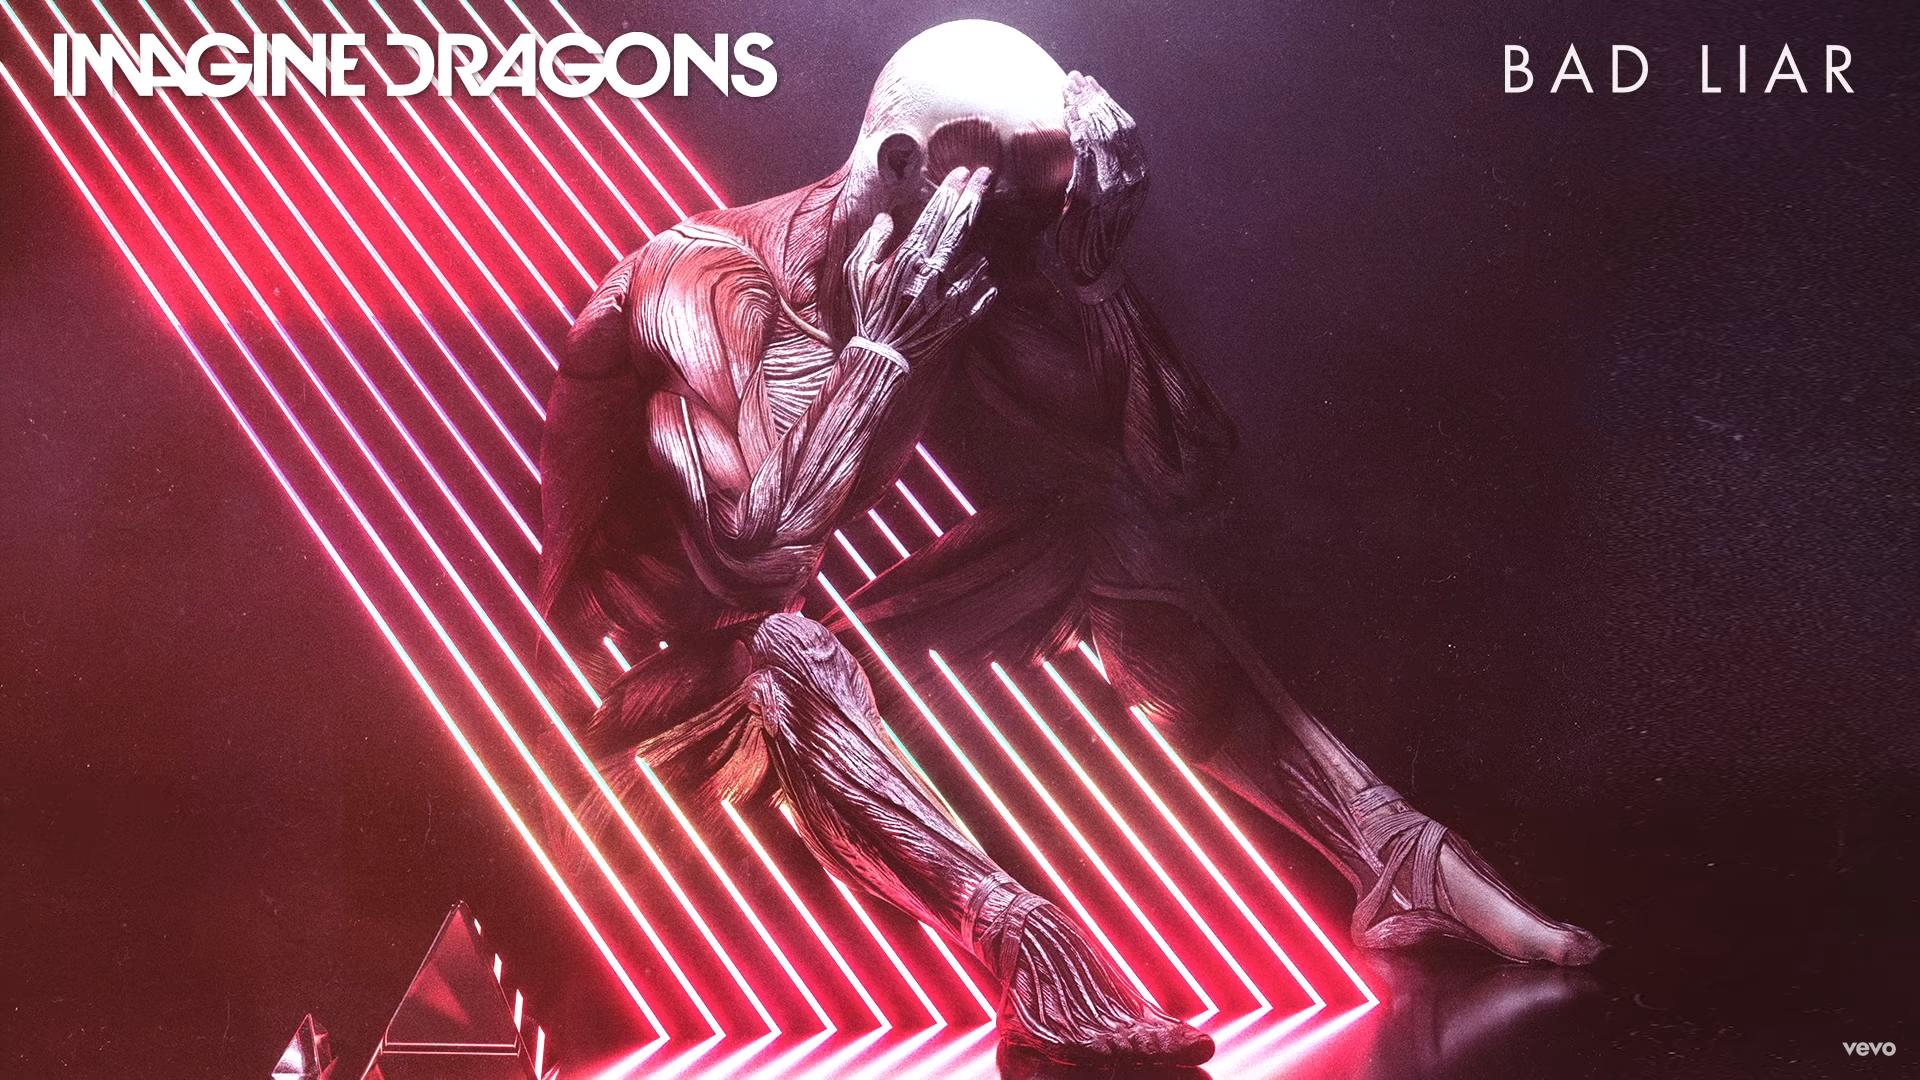 Imagine Dragons – Bad Liar